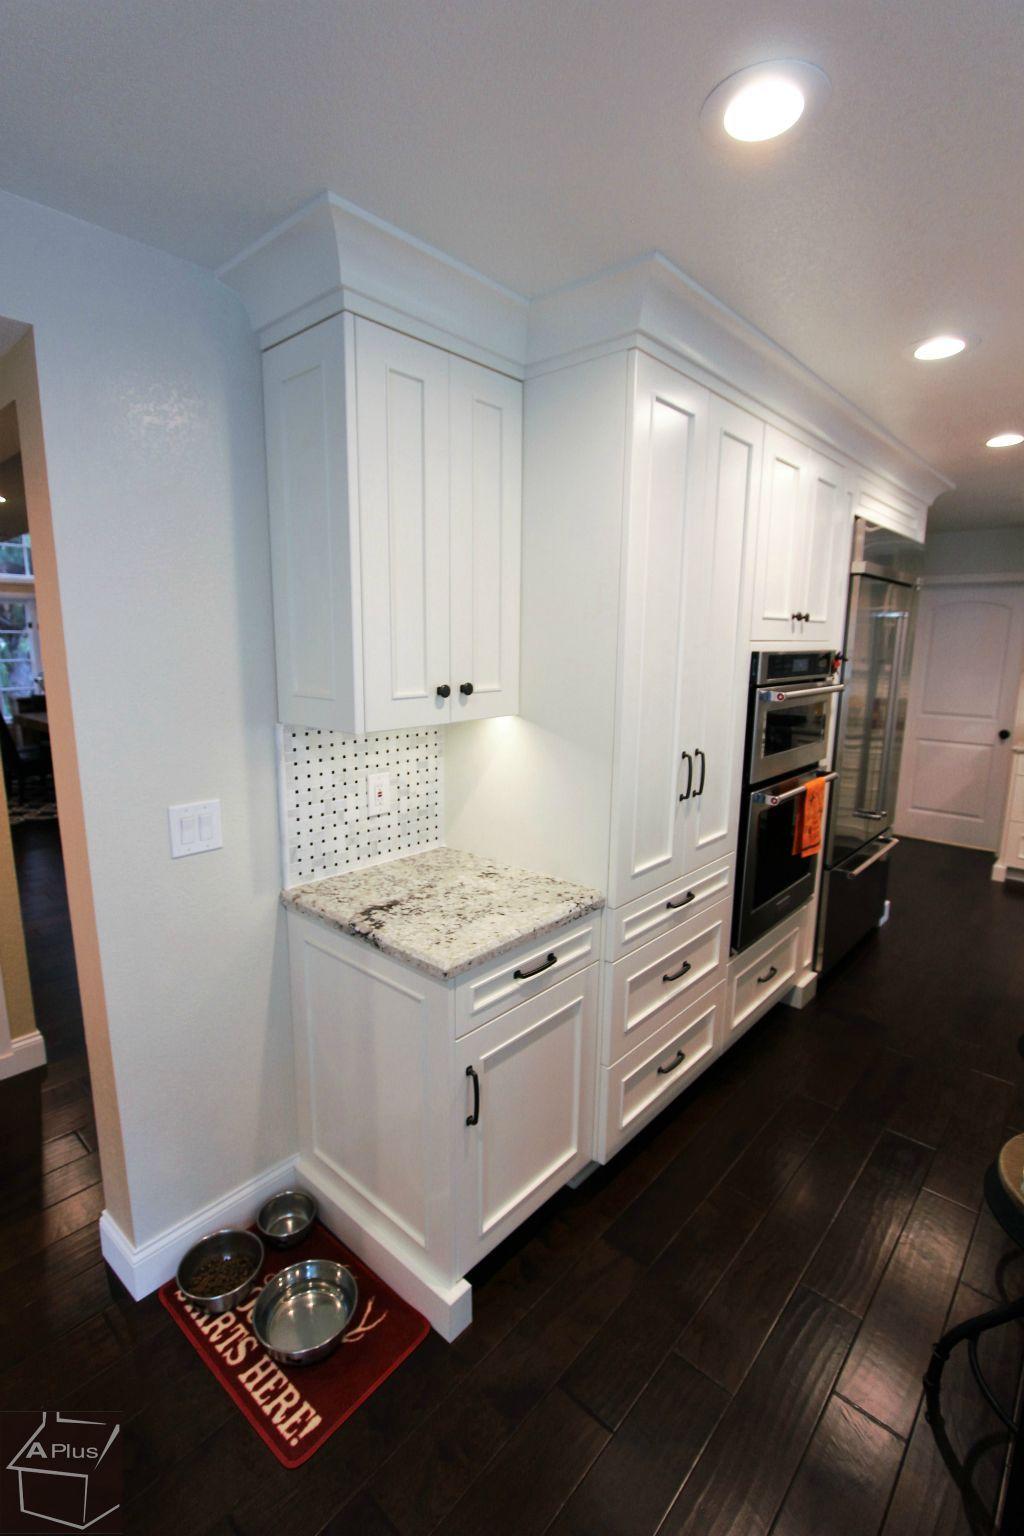 Design Build Home U0026 #kitchenRemodel With APlus #CustomCabinets In Santa Ana Orange  County. Contemporary Kitchen ...